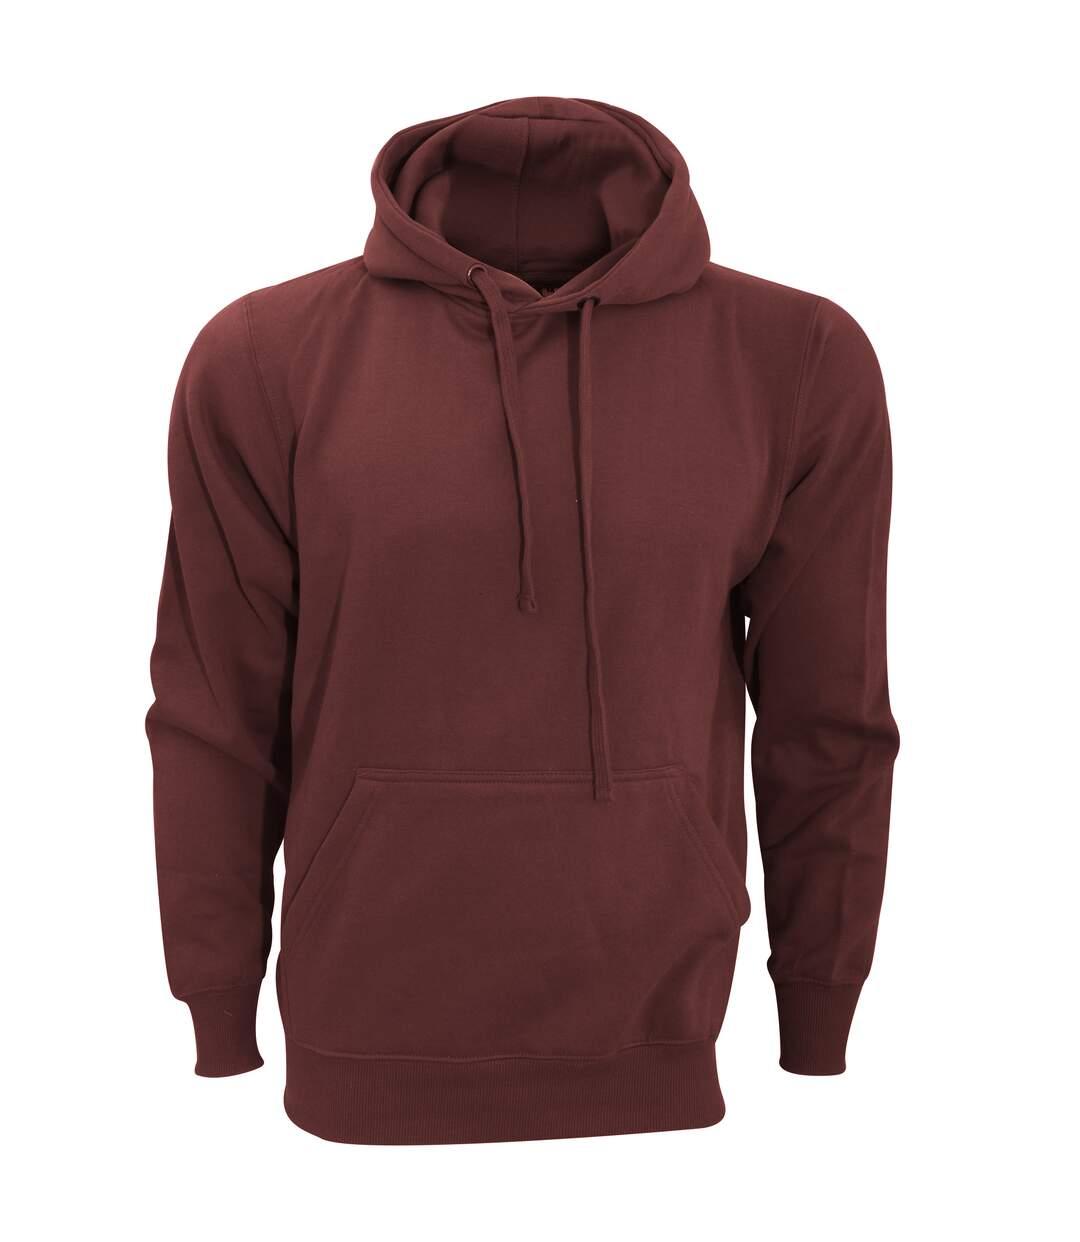 FDM Unisex Tagless Hooded Sweatshirt / Hoodie (Burgundy) - UTBC2031